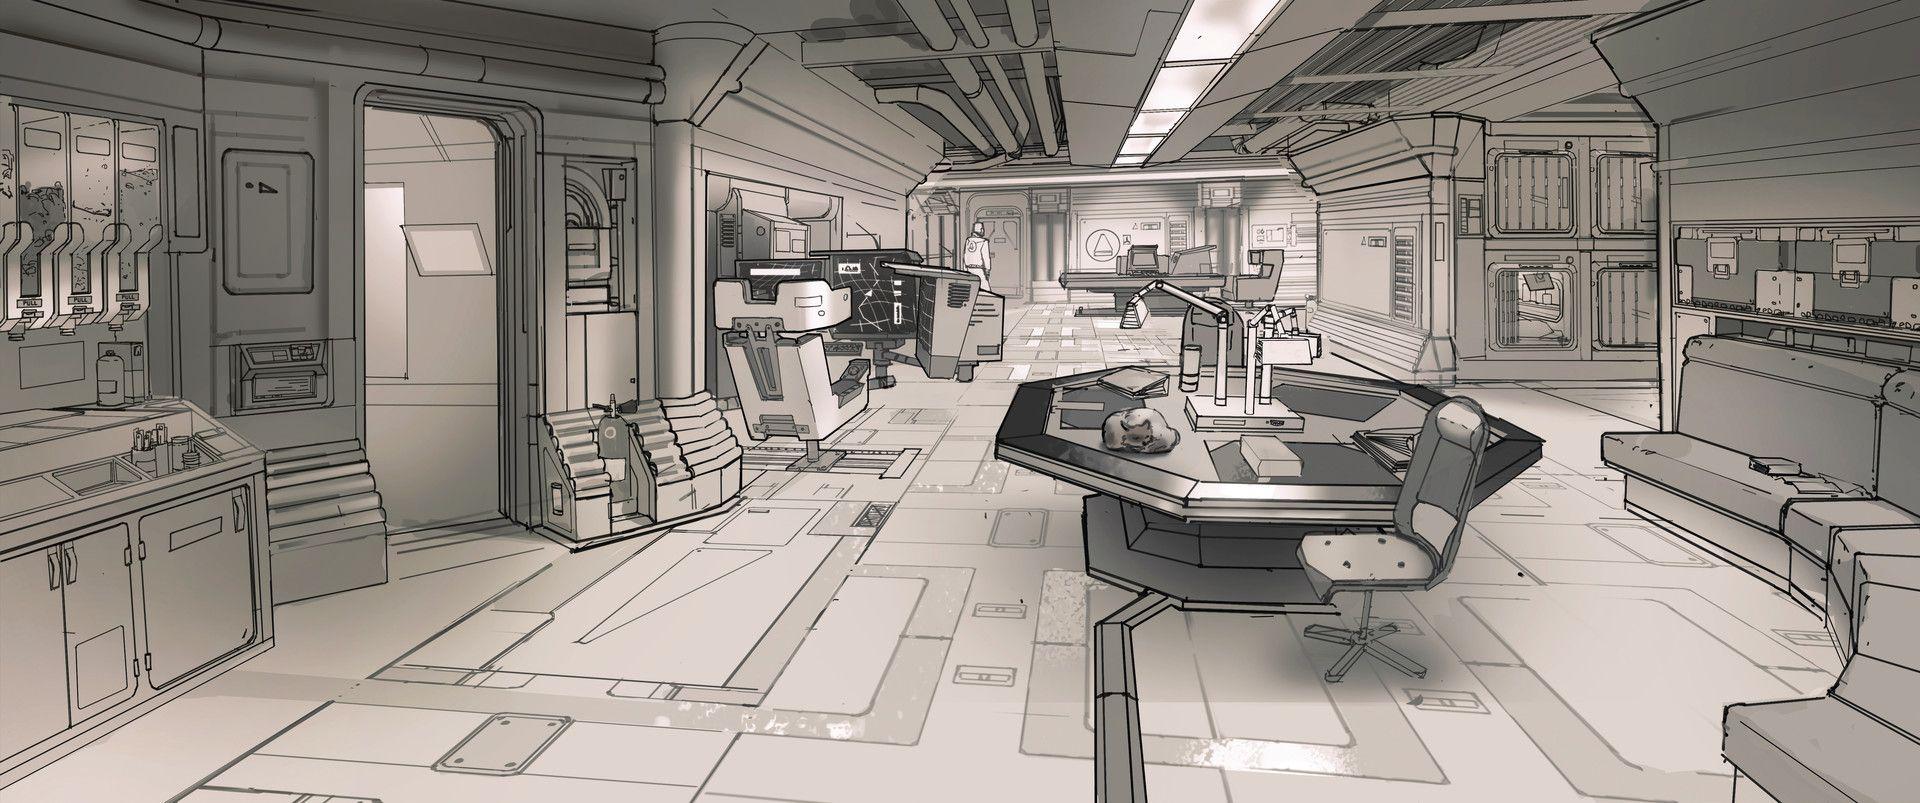 Artstation Demo Sci Fi Station Interior Design Adrien Girod